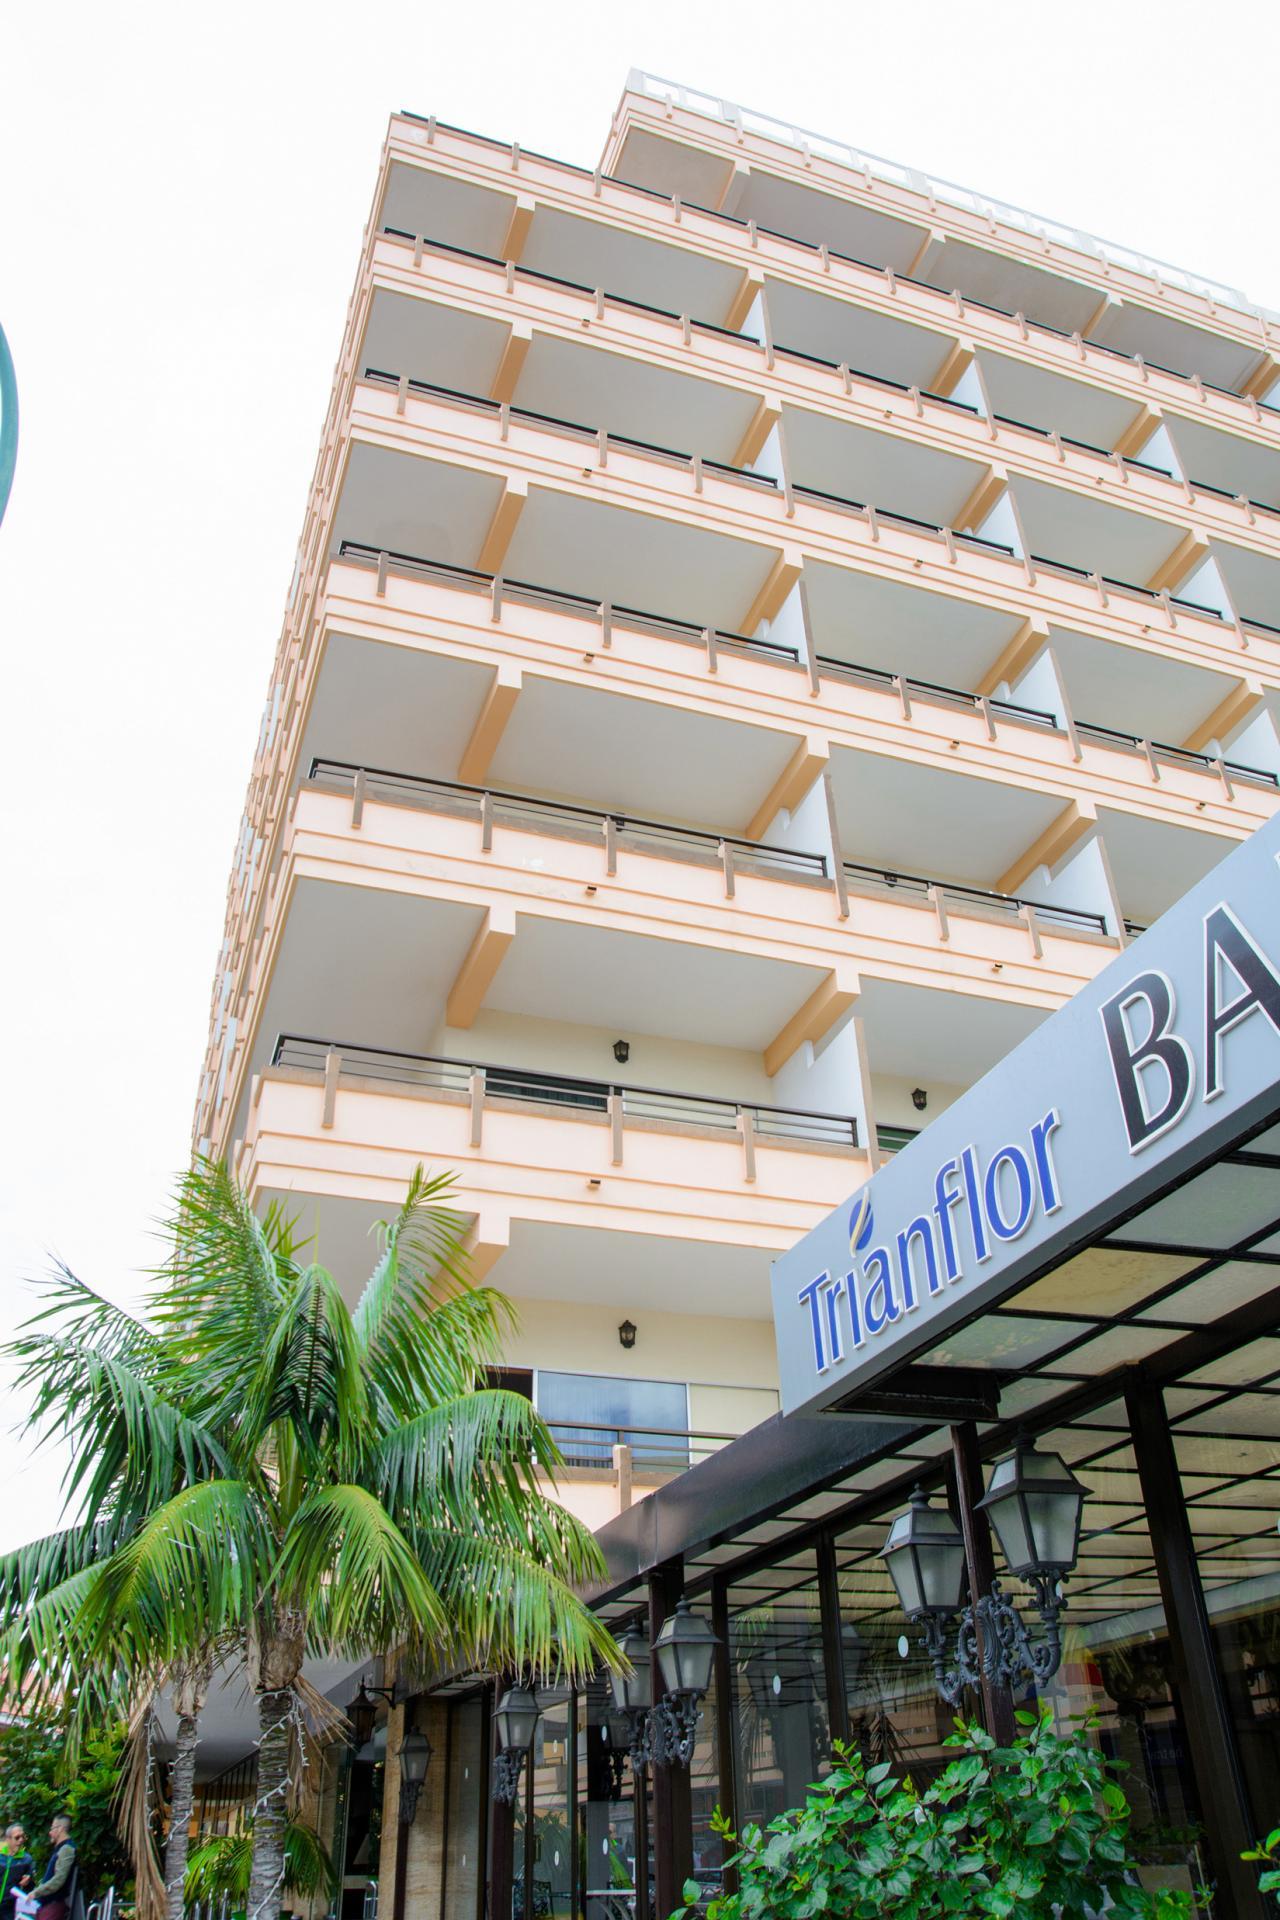 HC Hotel Magec (ex Trianflor)